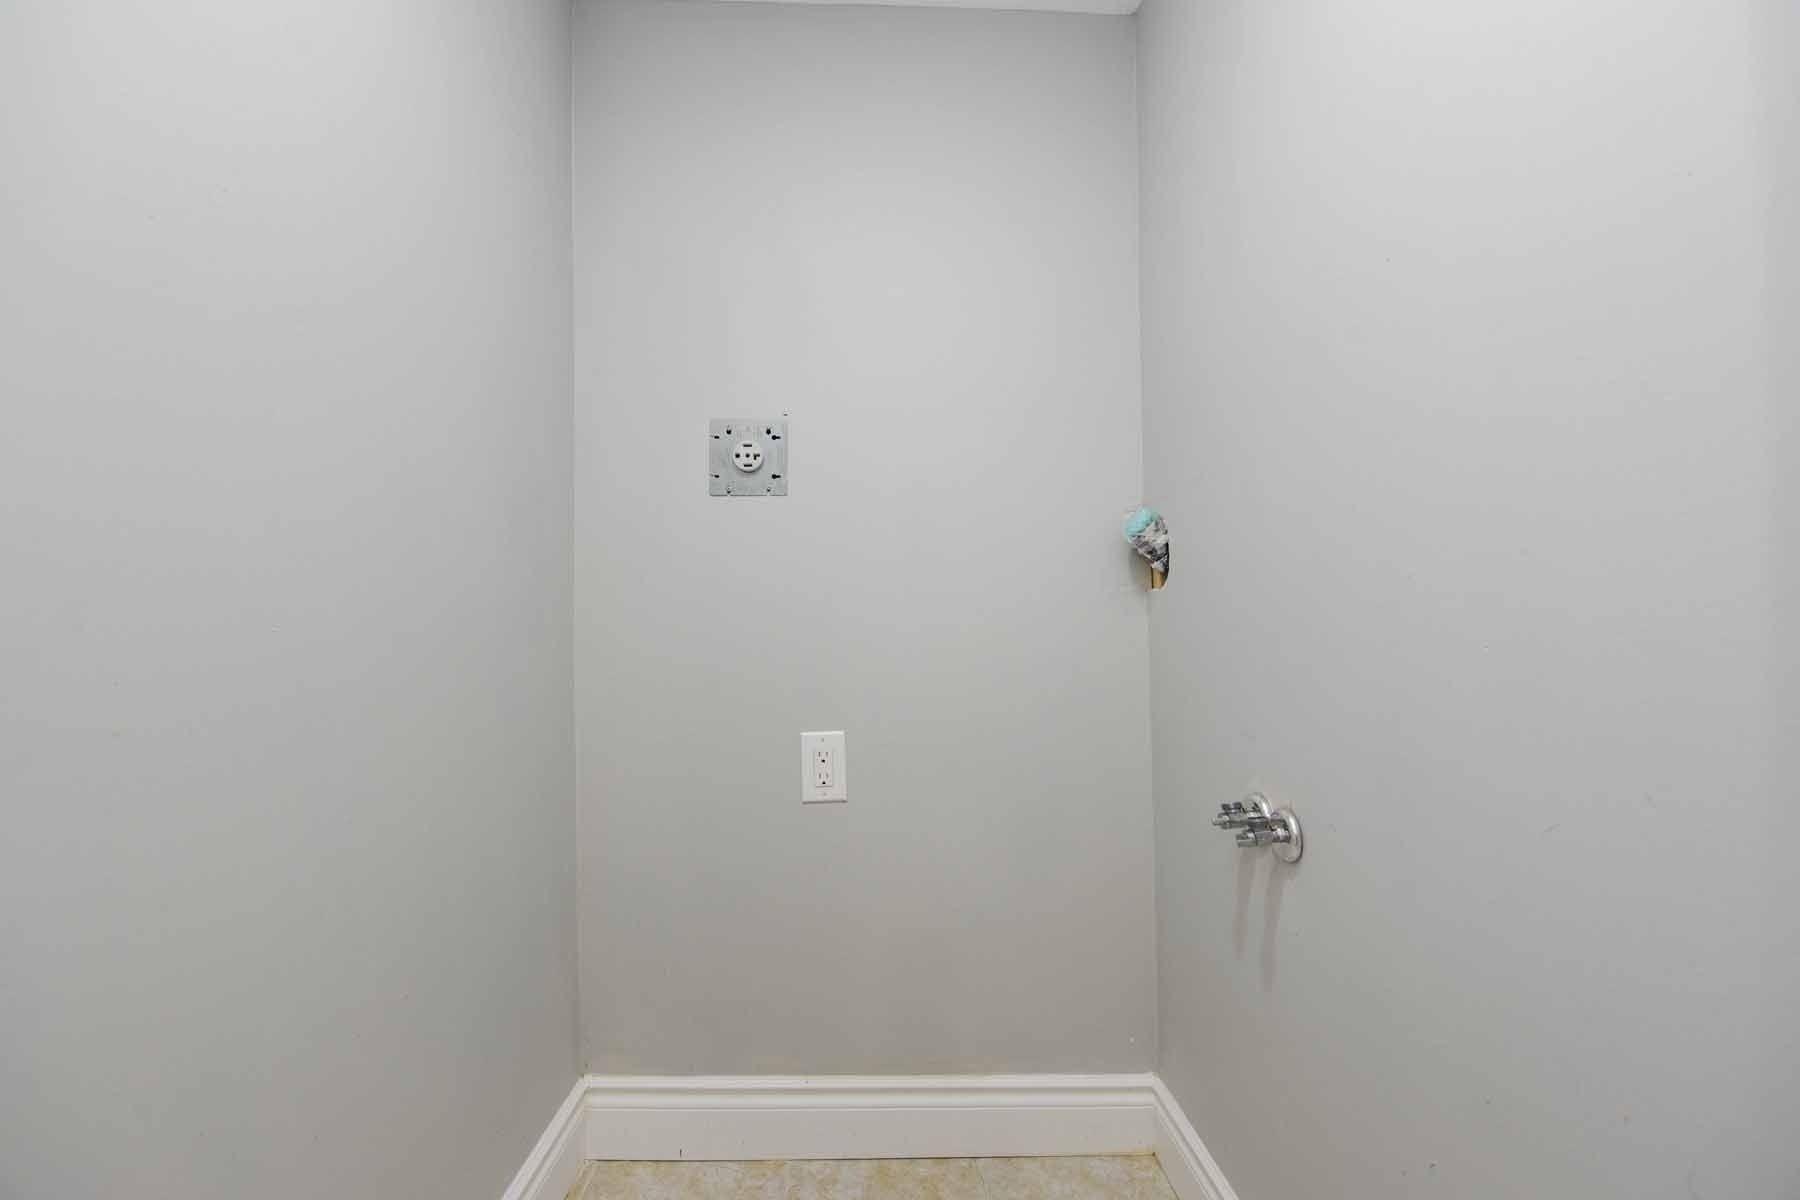 Photo 10: Photos: 20 Hallen Road in Brampton: Fletcher's West House (Apartment) for lease : MLS®# W5074220